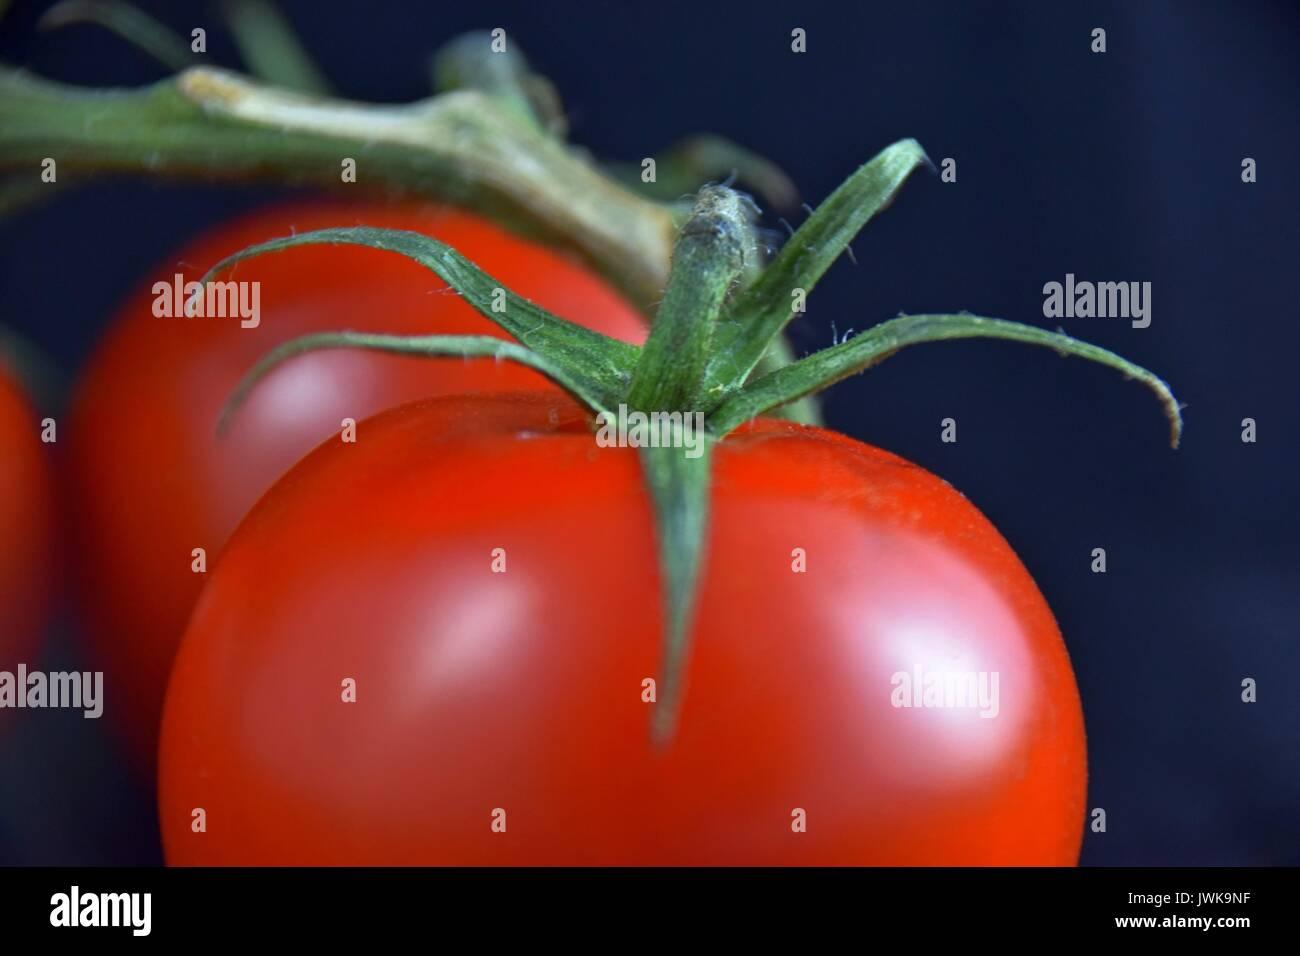 Ripe tomatoes, tomato, reife Tomaten, Solanum lycopersicum - Stock Image